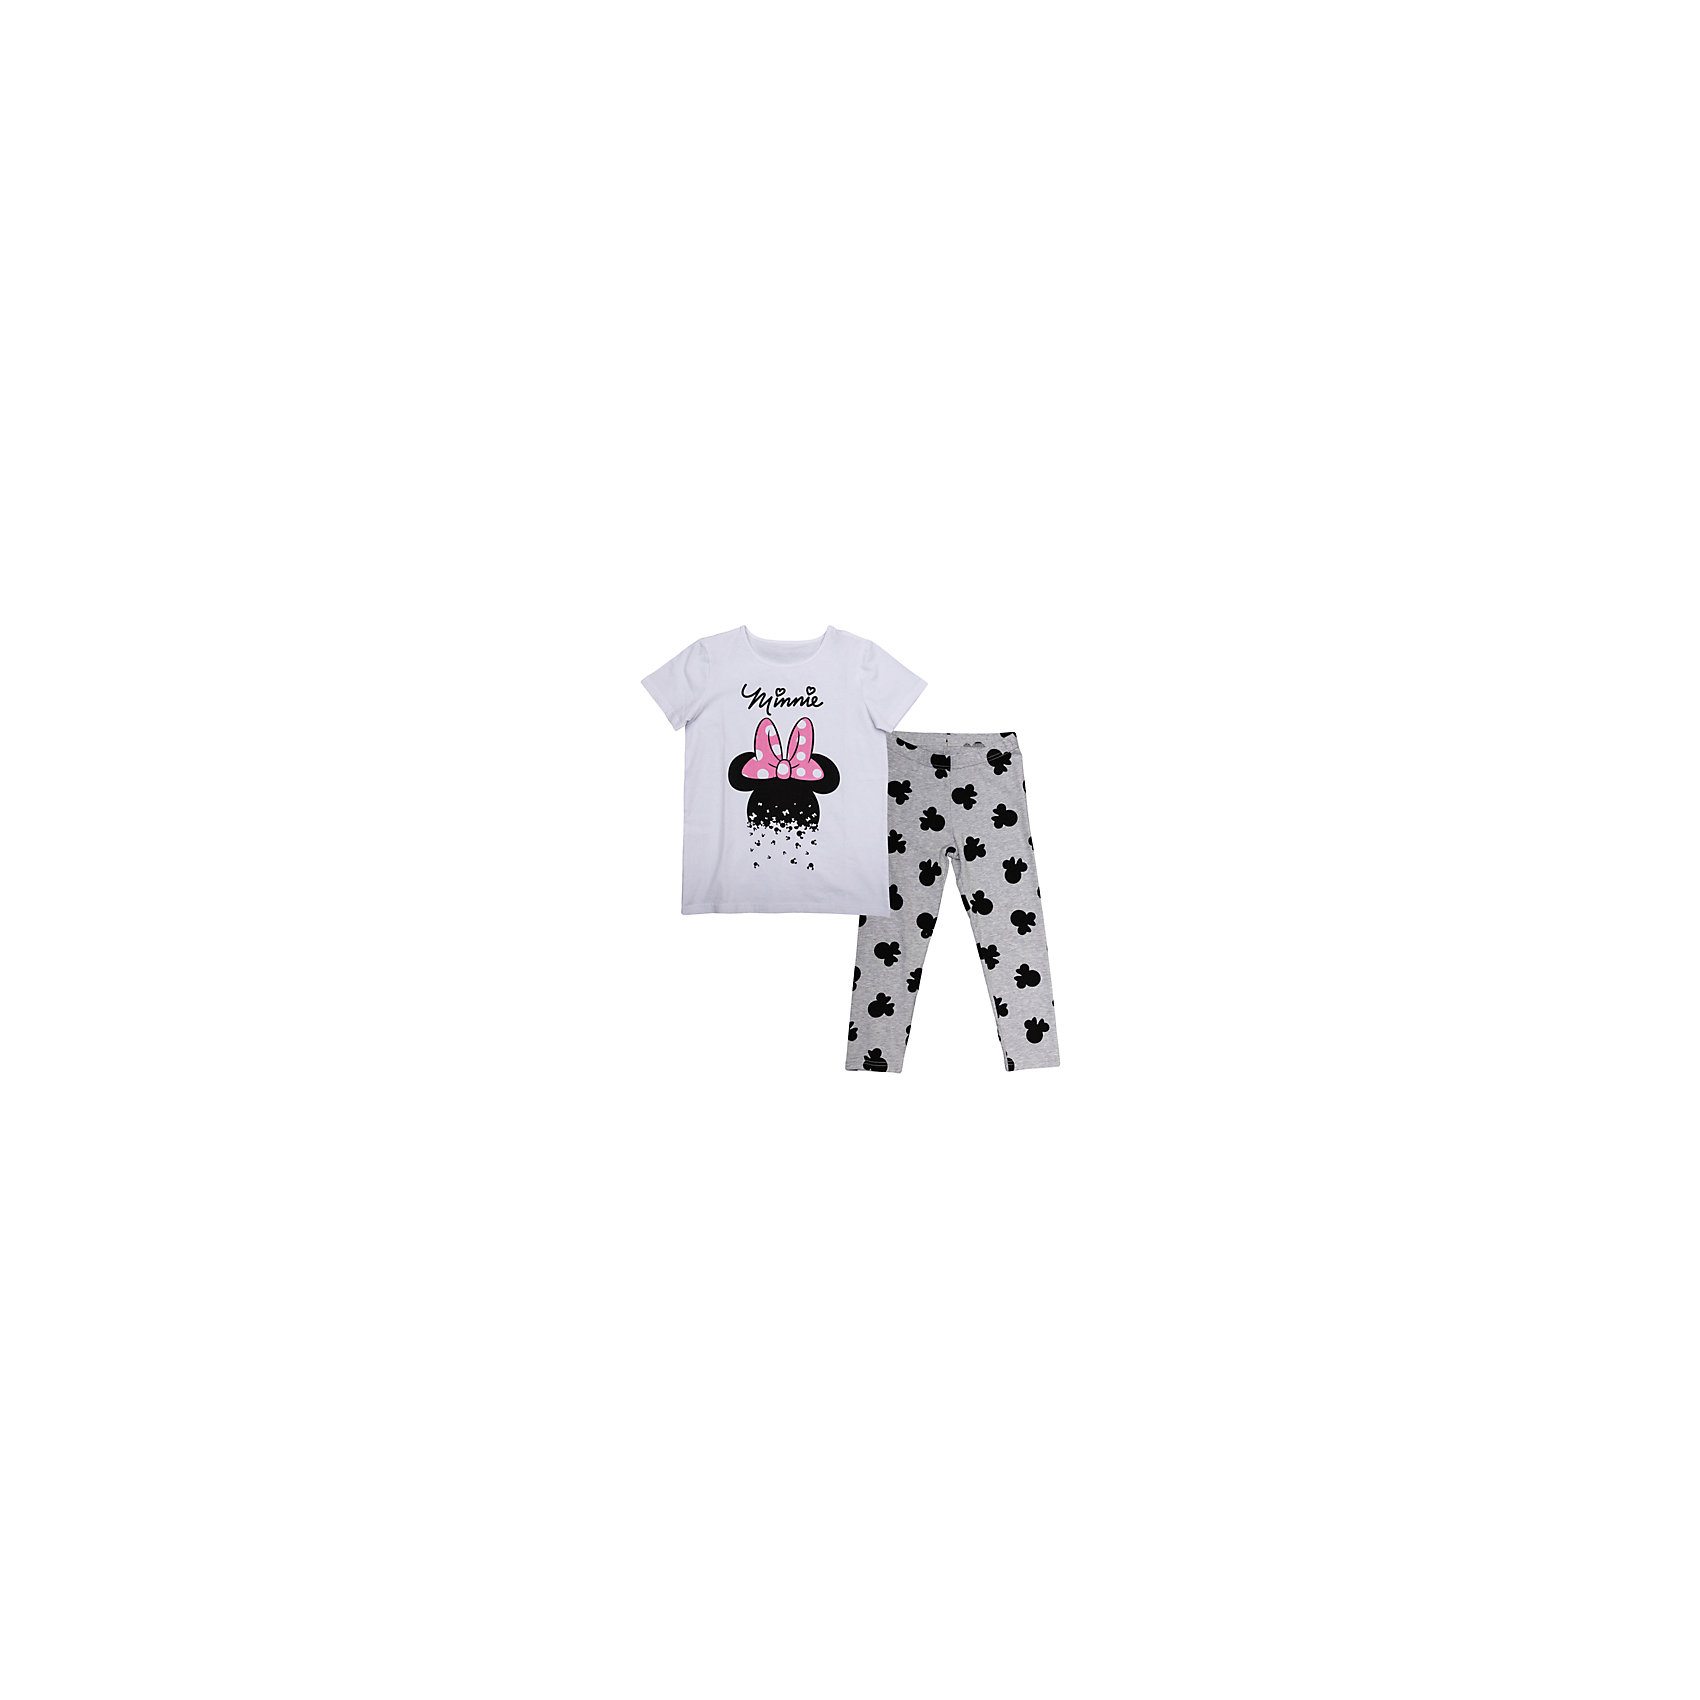 S'cool Комплект: футболка и леггинсы для девочки S'cool